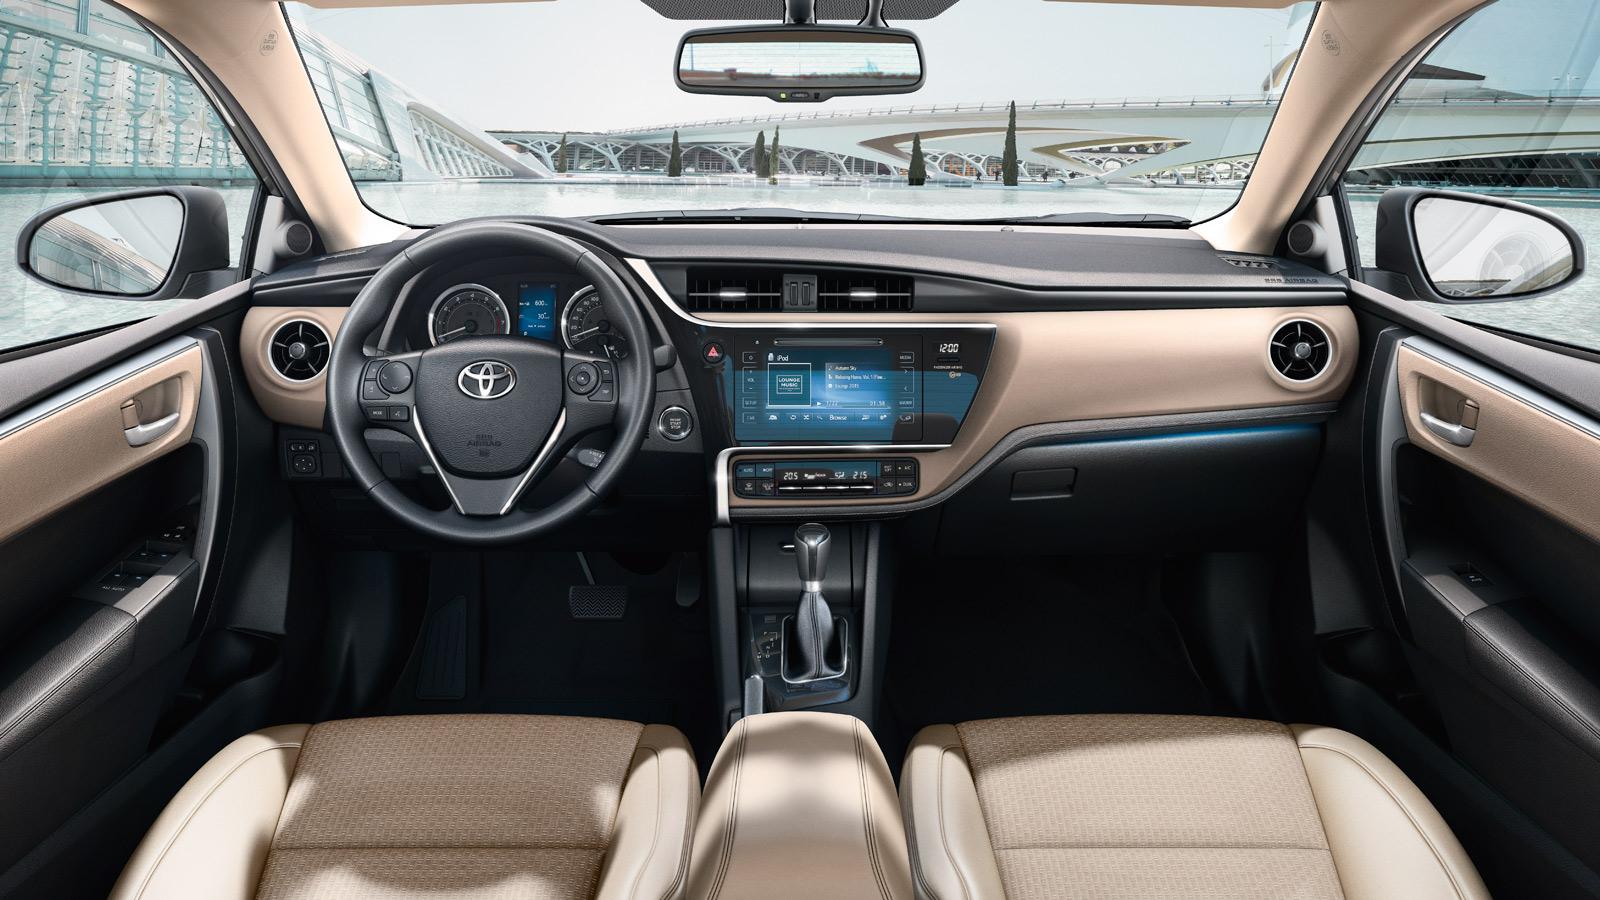 2017 Toyota Corolla Interior Images